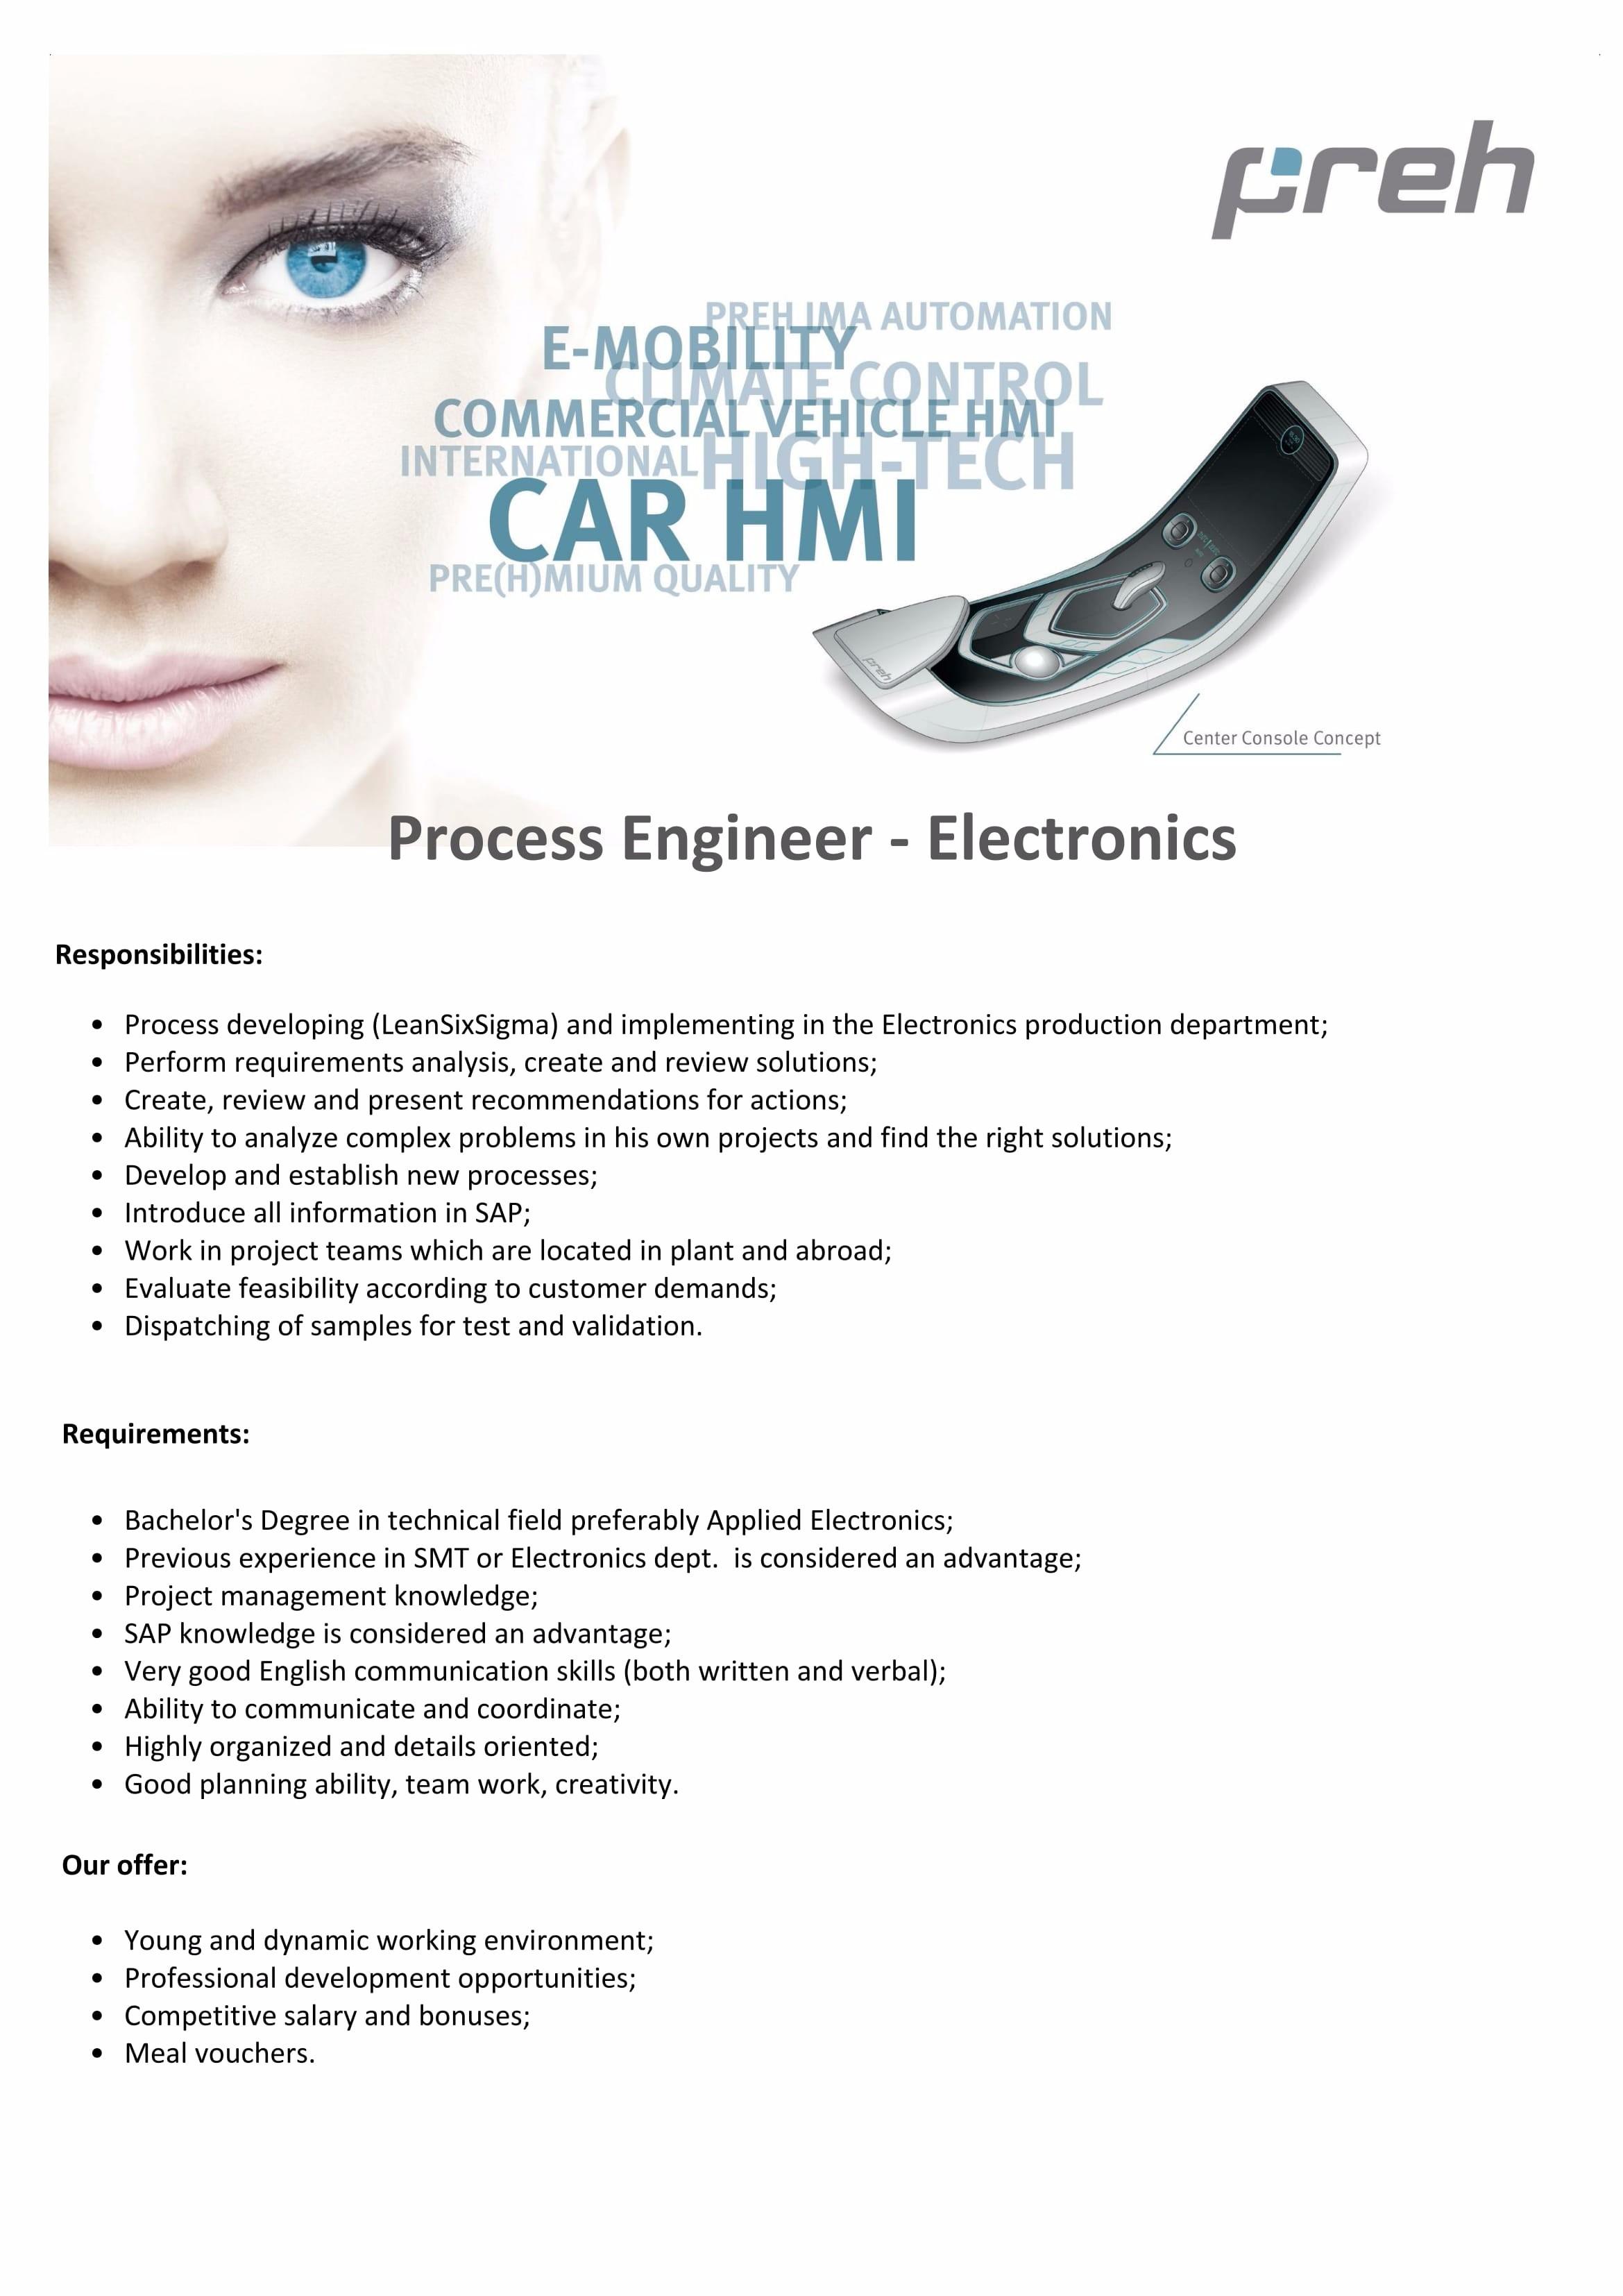 Process Engineer Electronics-1